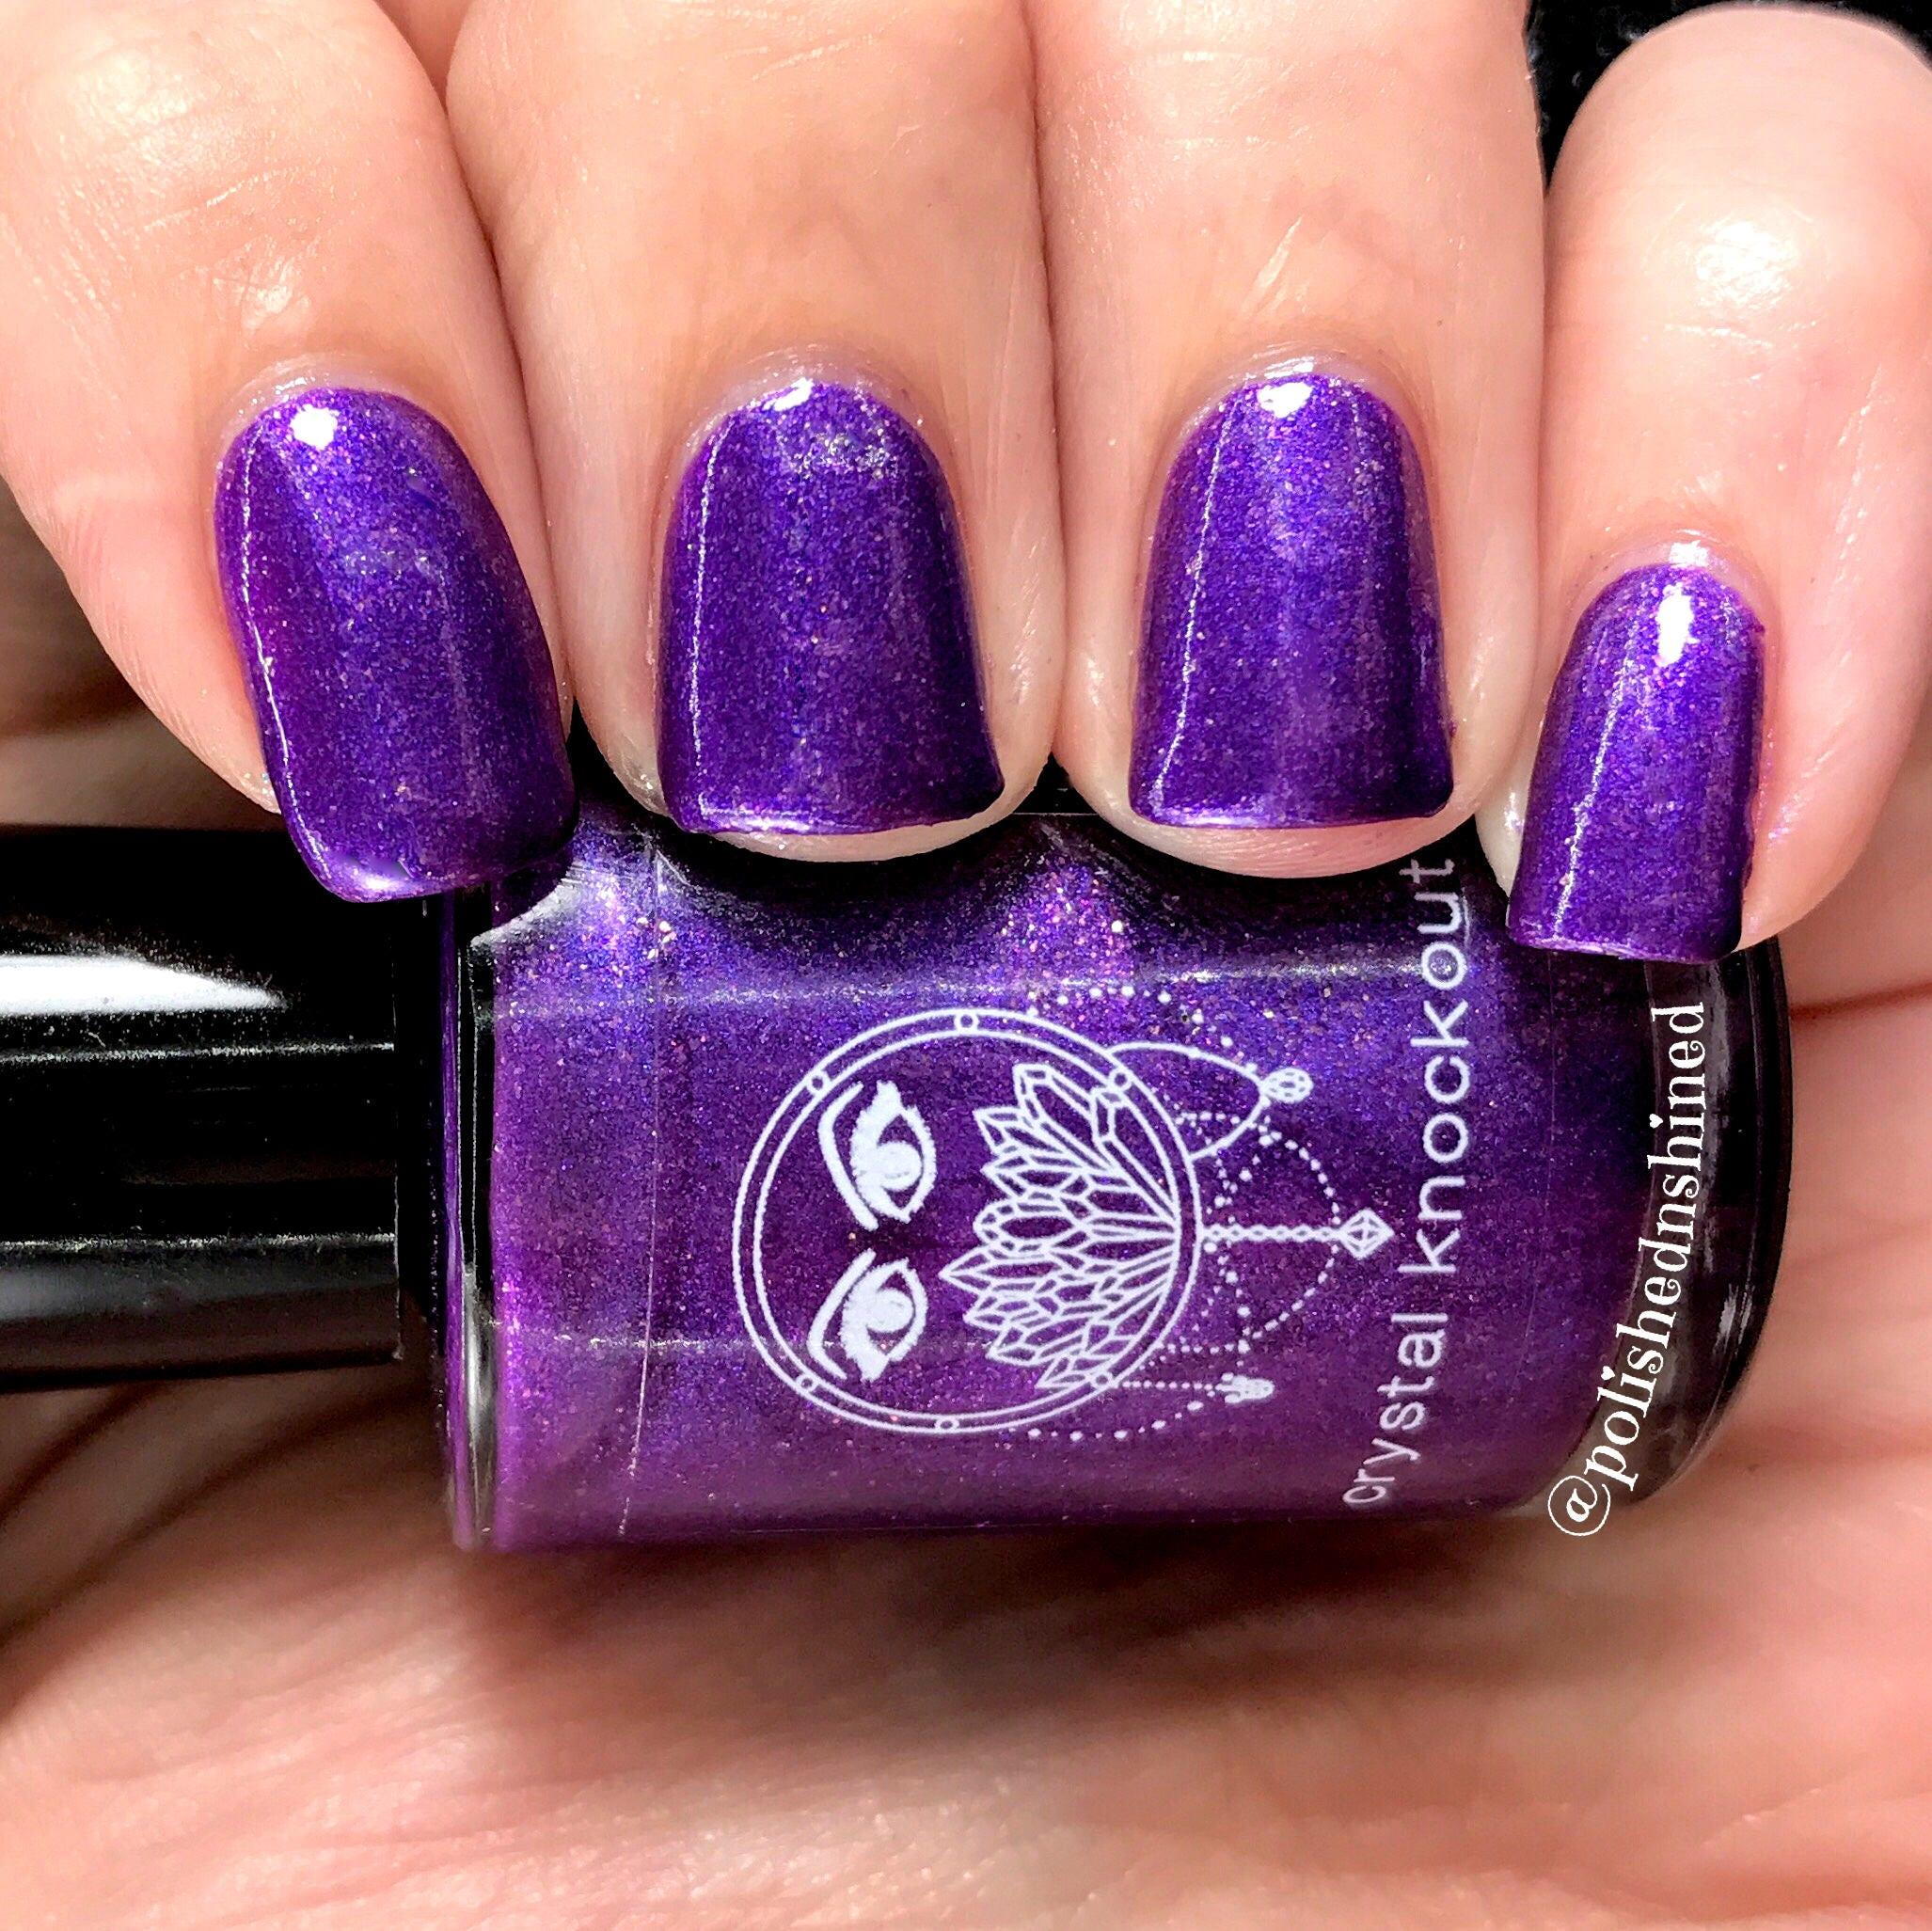 Purple Nail Polish - Deep Purple Gold Shimmer - Dragon Realm from ...